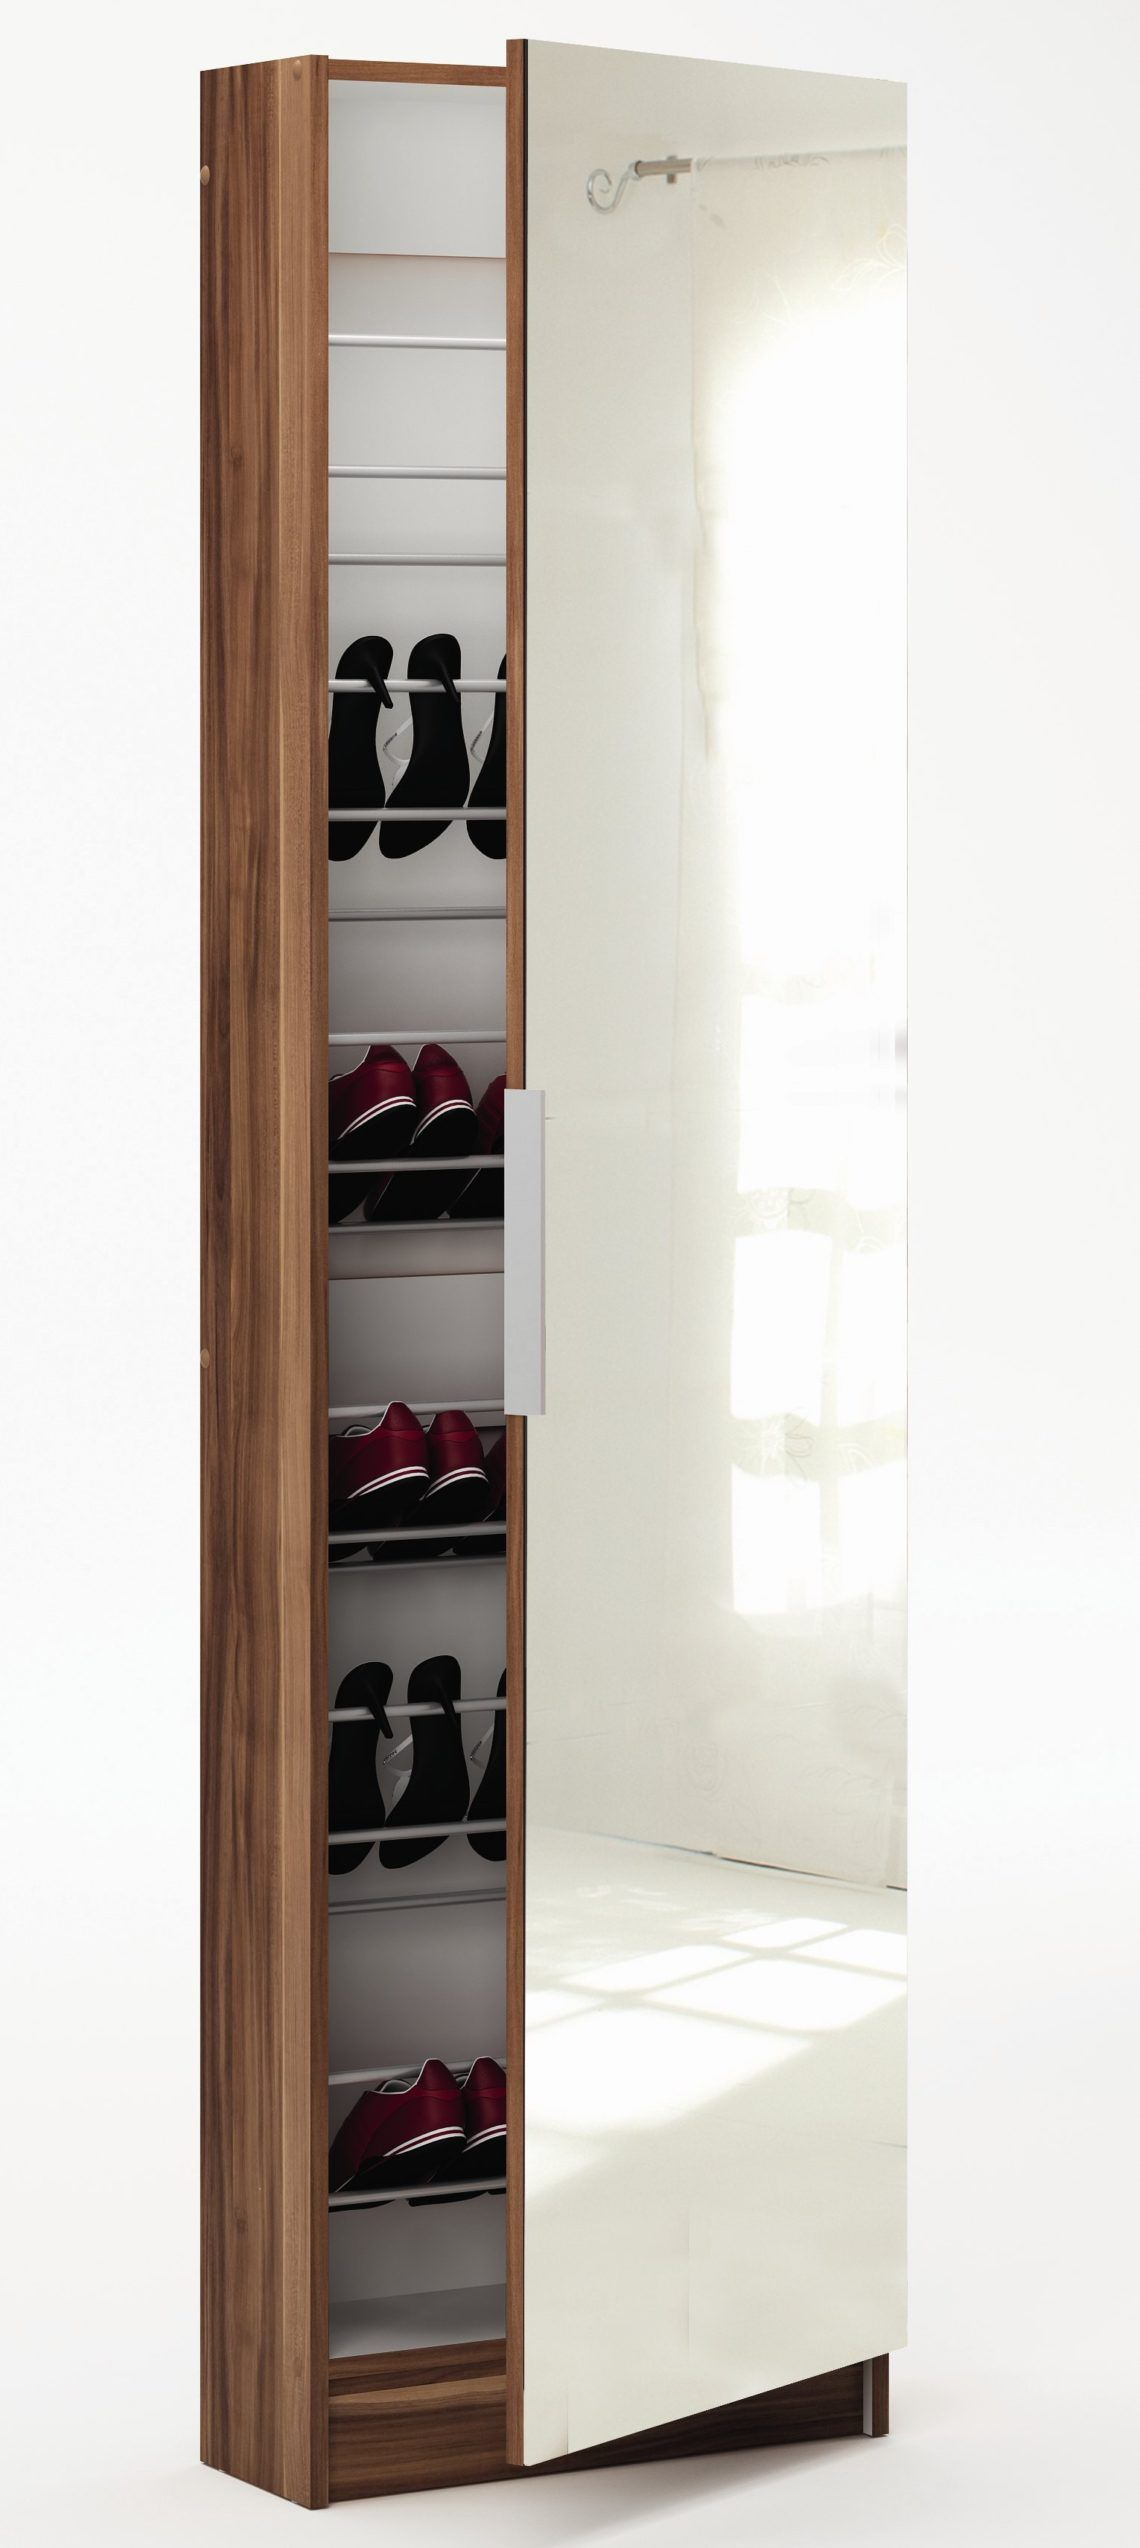 Beau Meuble Chaussures Alinea Shoe Cabinet Ideas Tall Cabinet Storage Shoe Cabinet